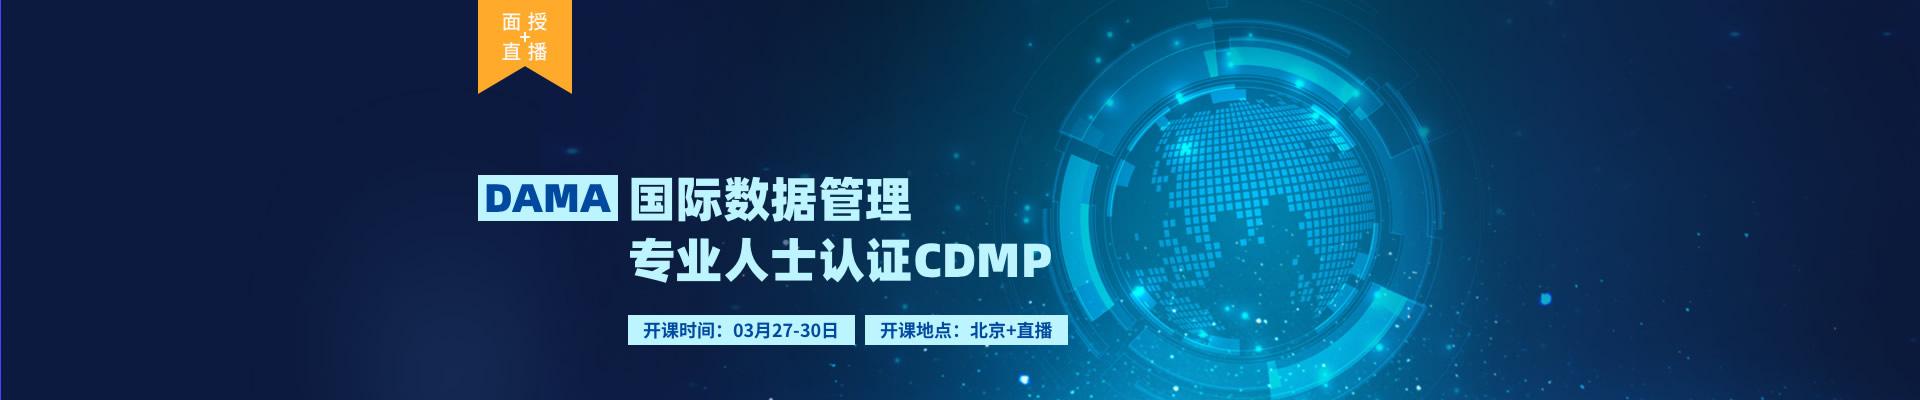 DAMA国际数据管理专业人士CDMP认证